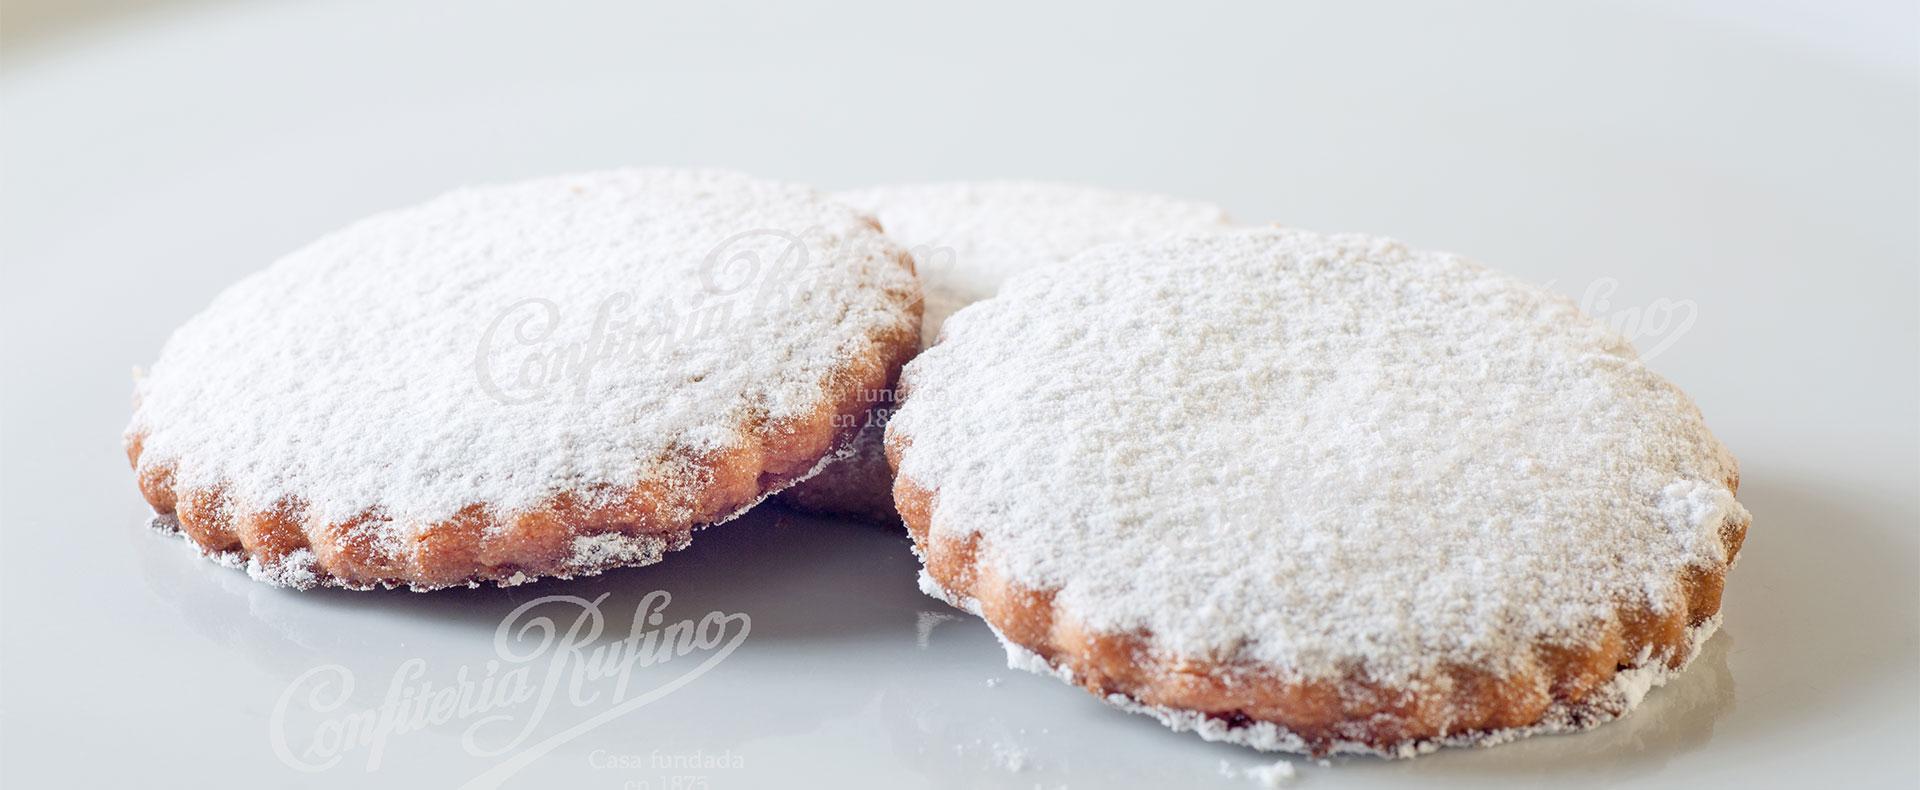 torta de polvorón Confitería Rufino Aracena